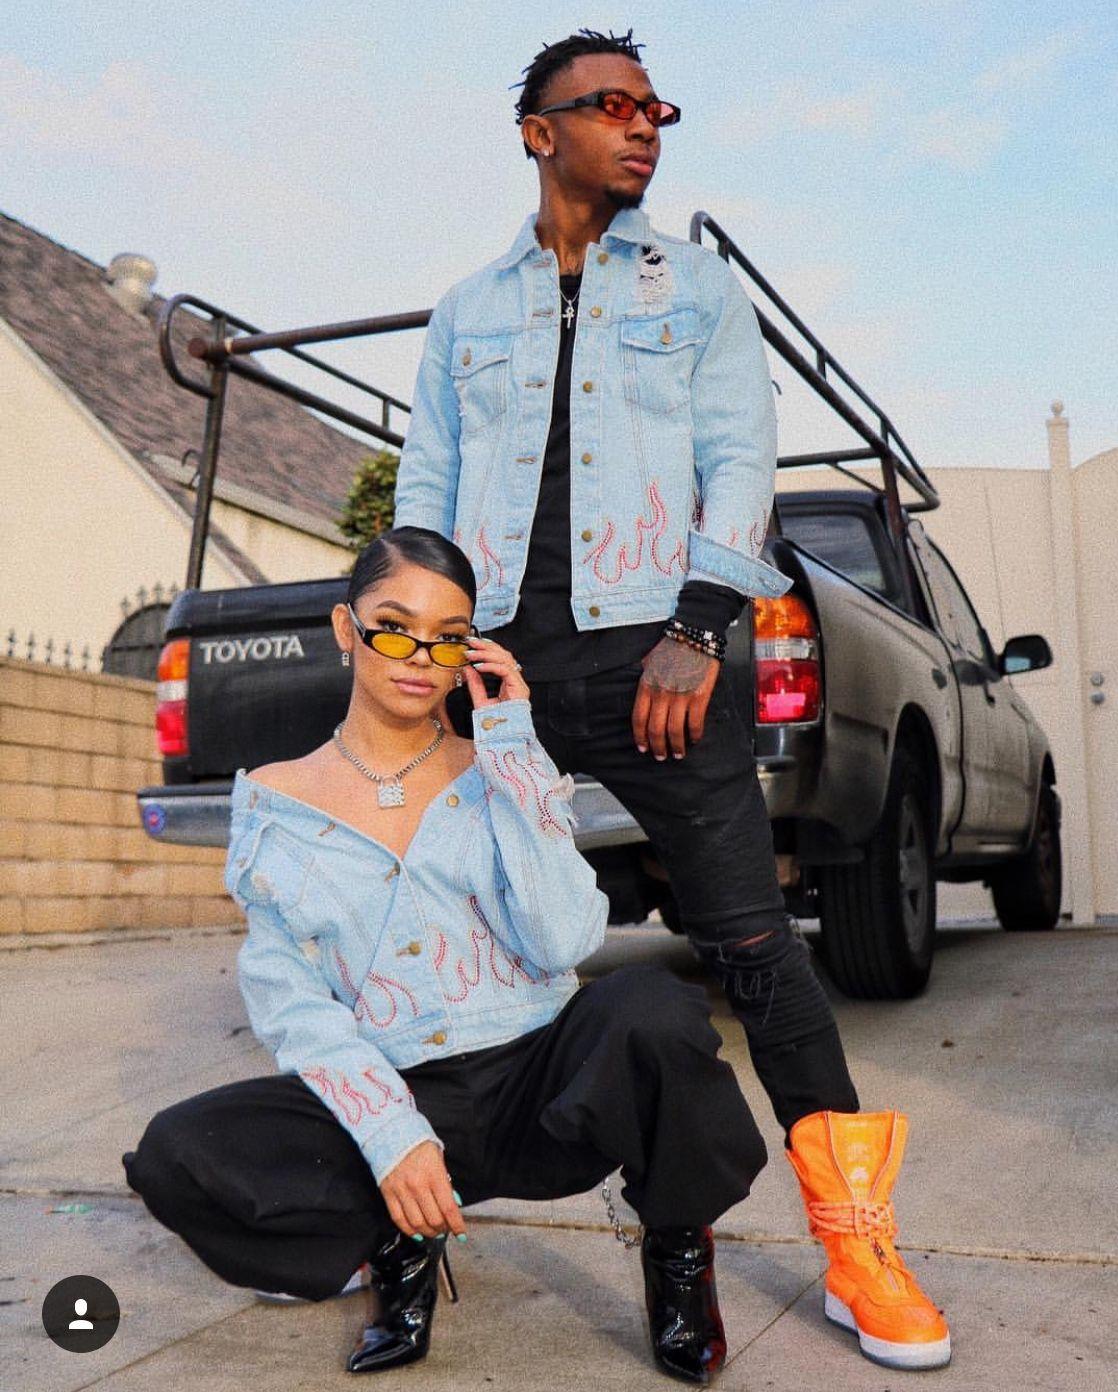 ƒօӏӏօա ʍҽ Noraisabelle ƒօɾ ʍօɾҽ թiղs վօմ ɾҽ ցօղղɑ ӏօѵҽ Black Couples Goals Couple Outfits Cute Couple Outfits